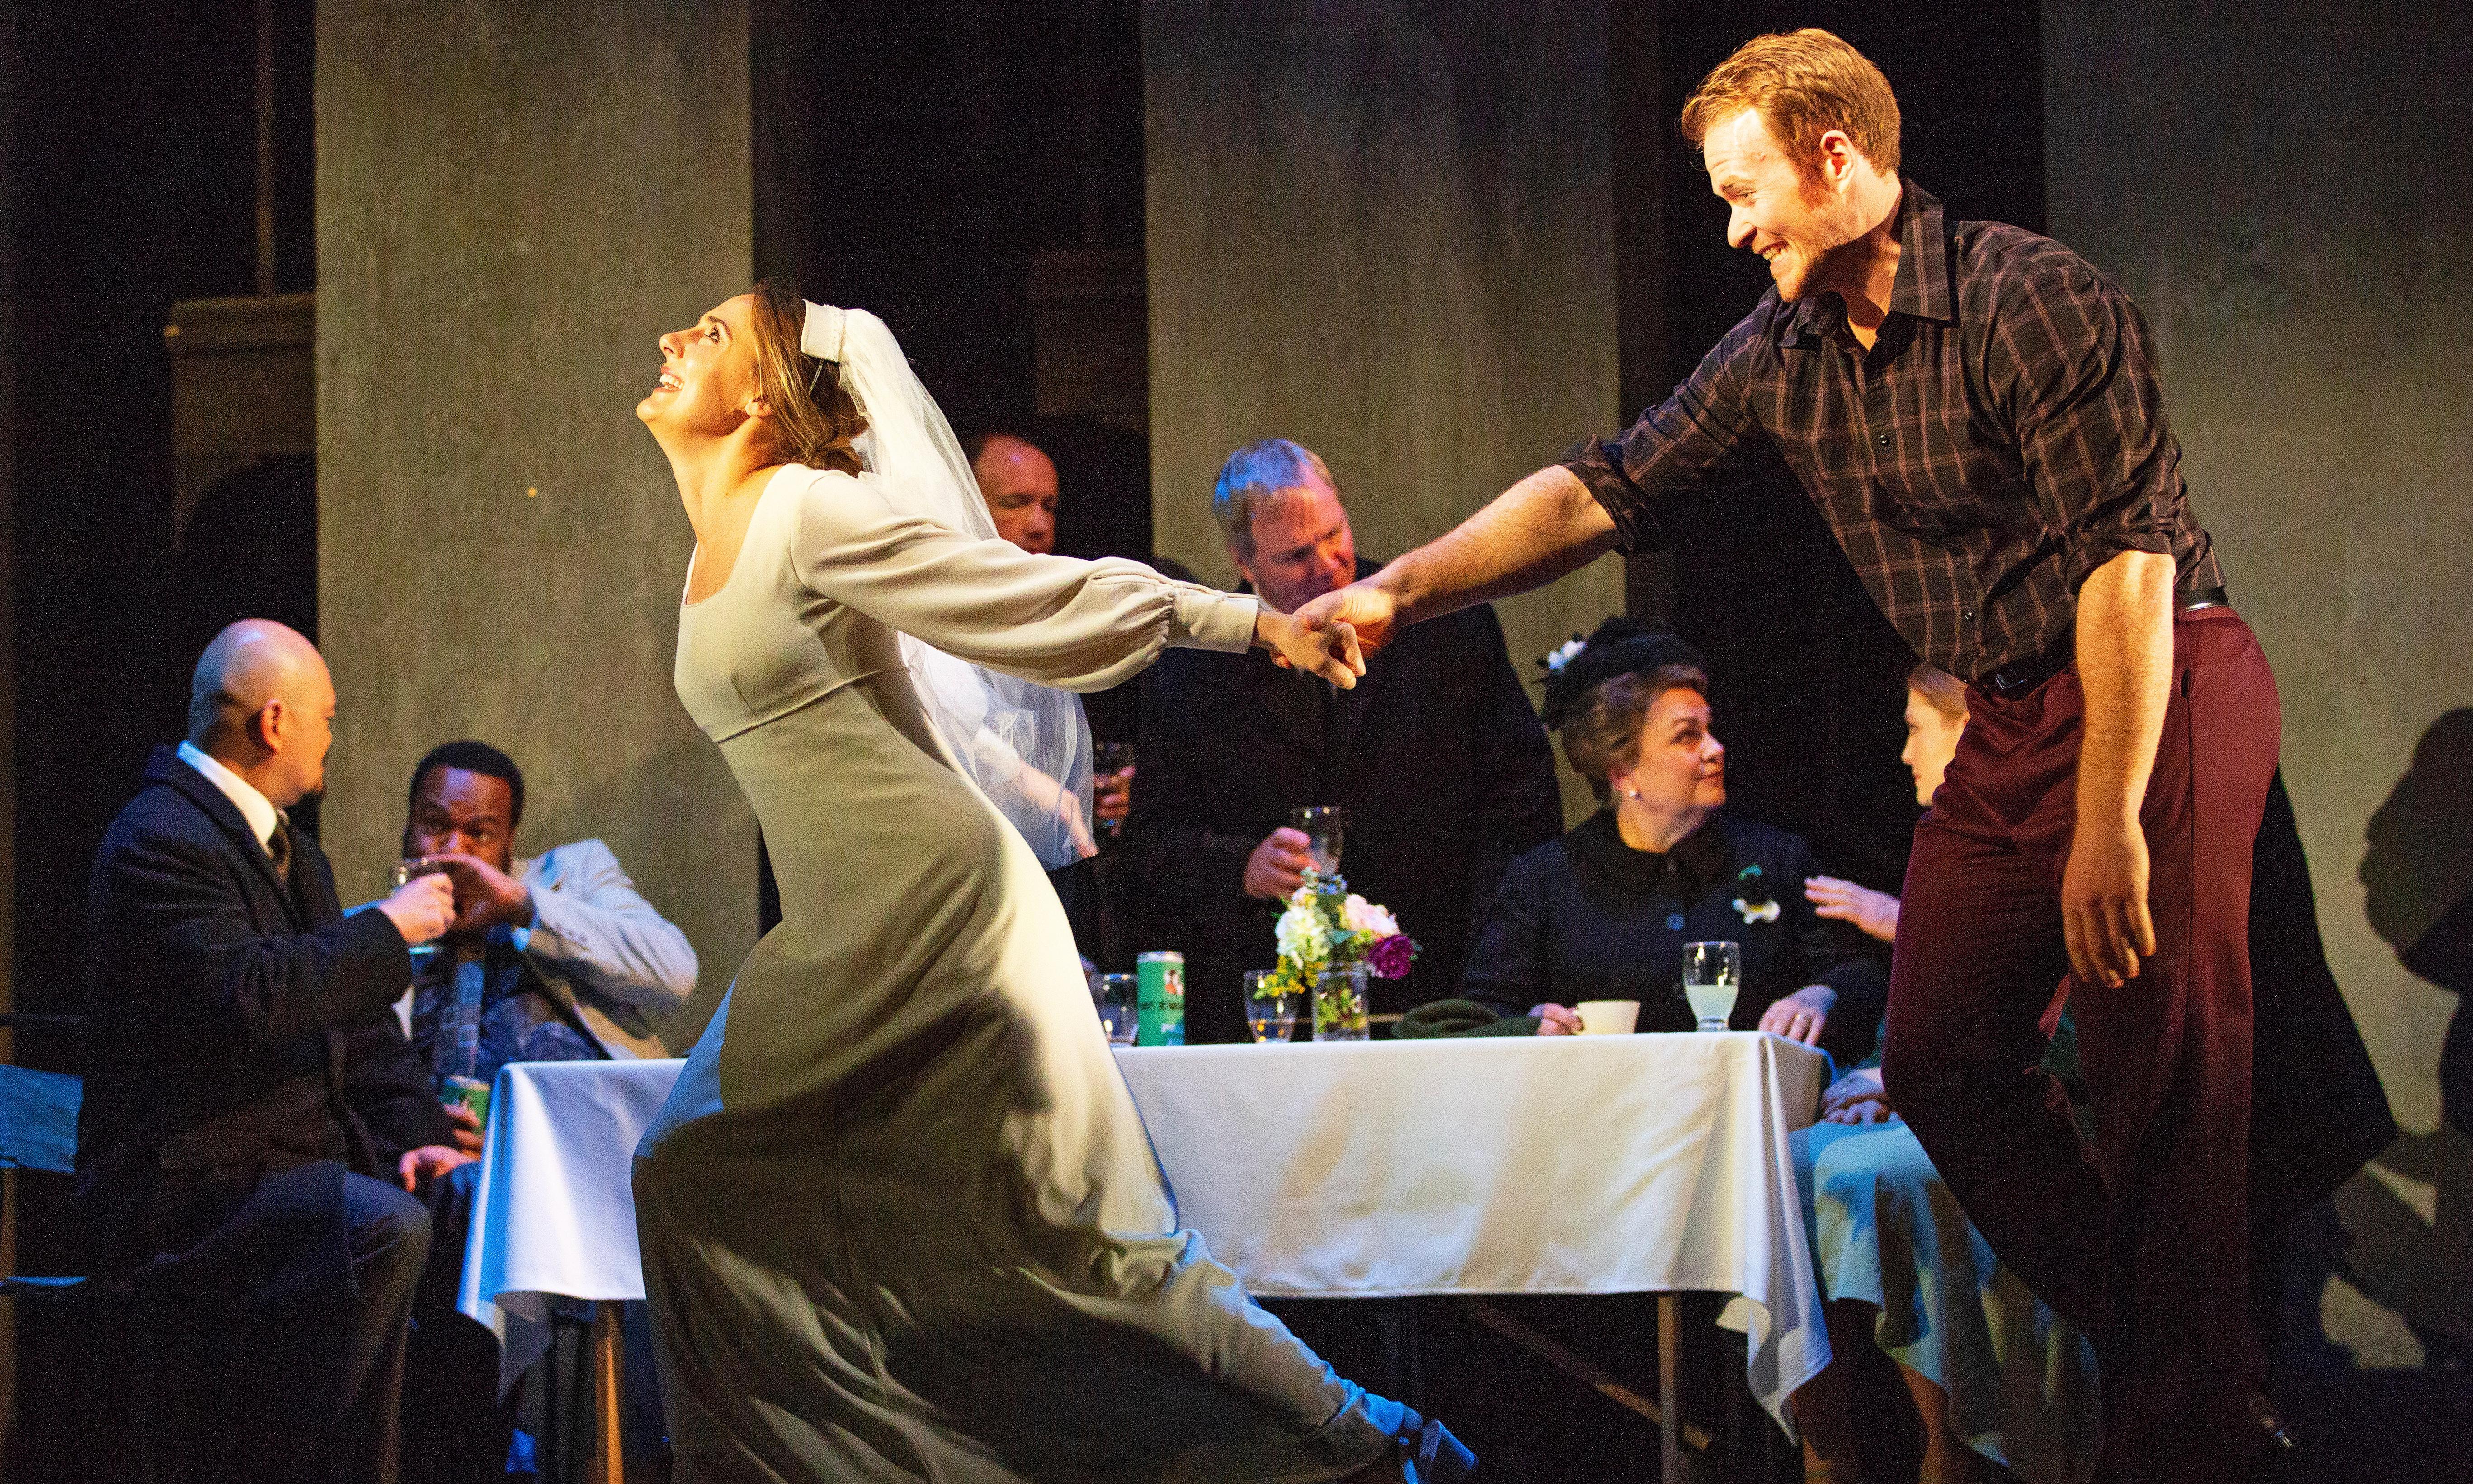 Breaking the Waves review – Von Trier's bleak drama feels lost in translation